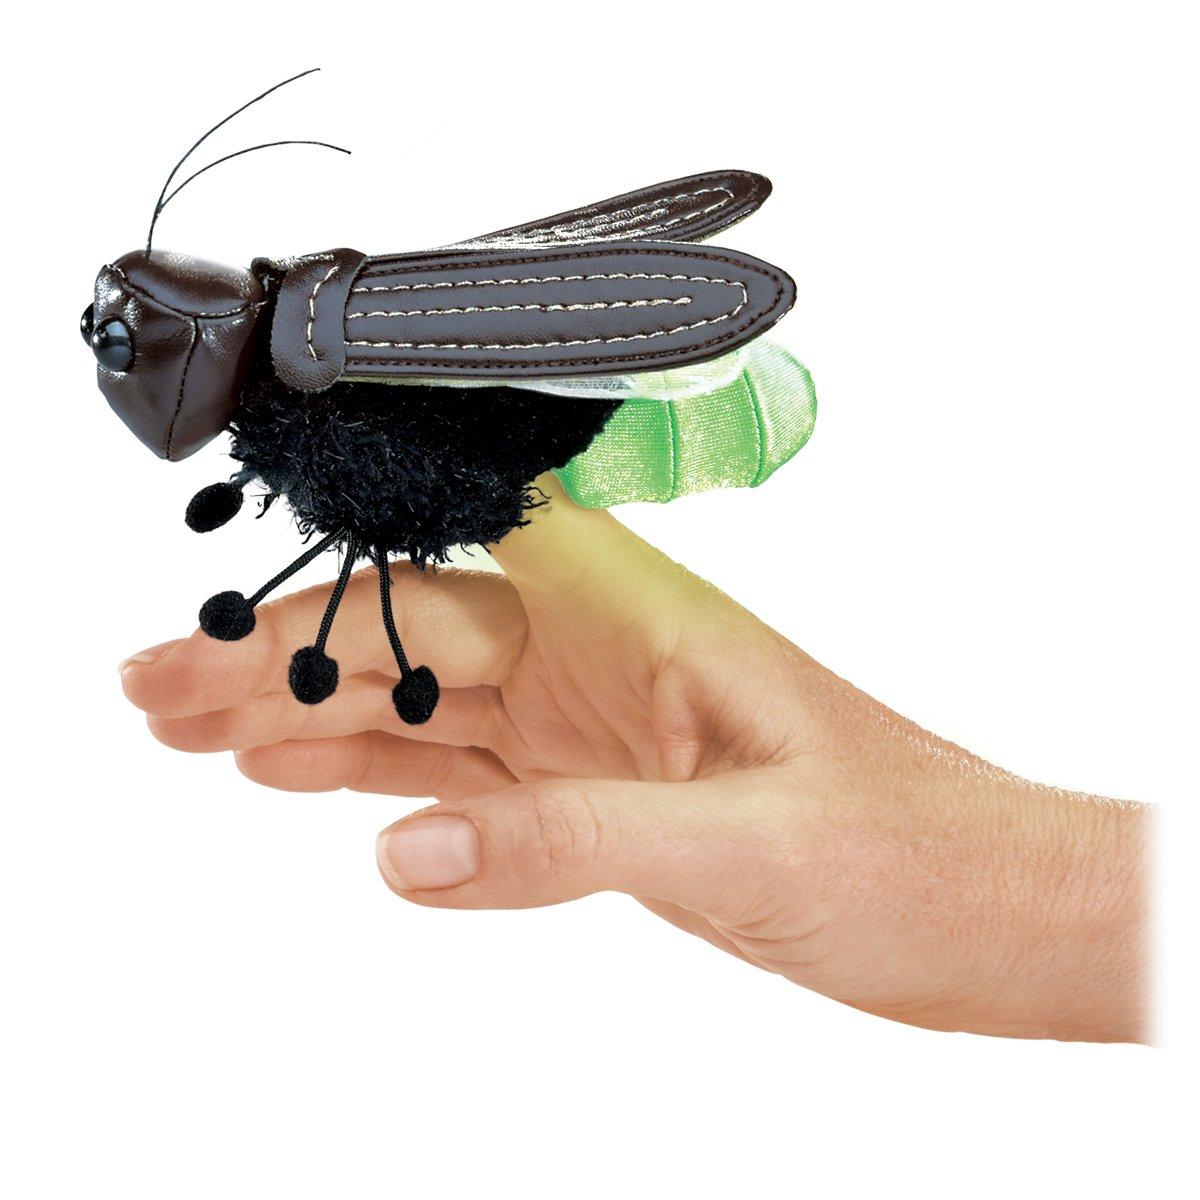 Folkmanis Mini Firefly Finger Puppet Folkmanis Puppets 2728